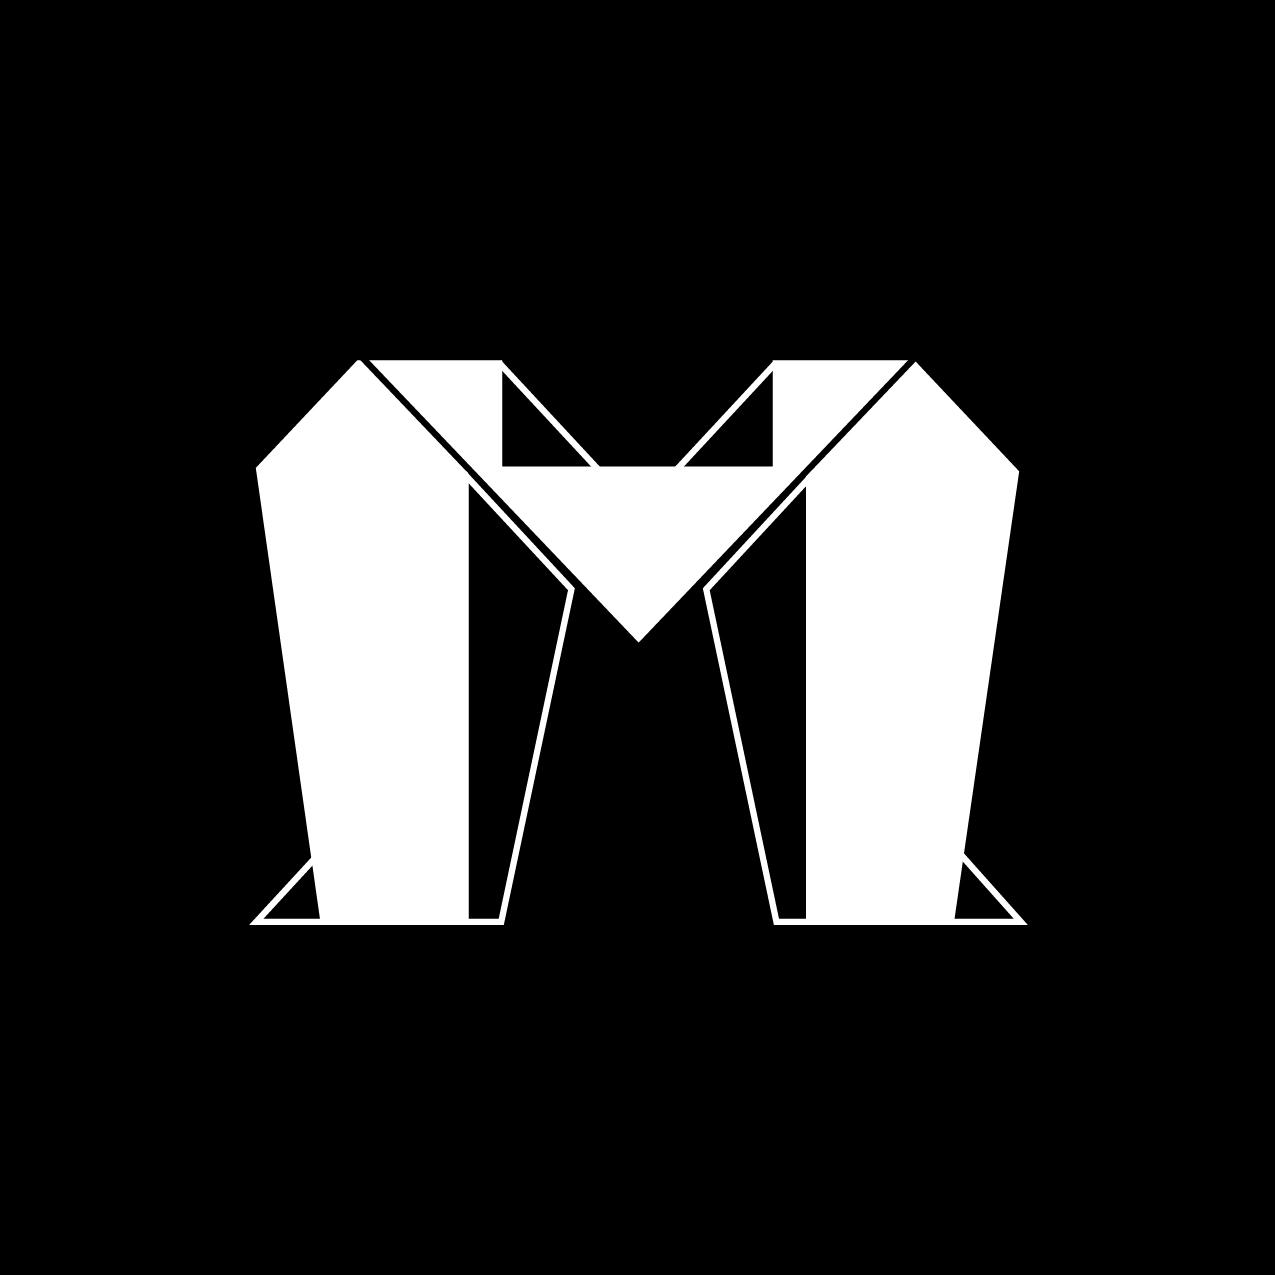 Letter M11 Design by Furia